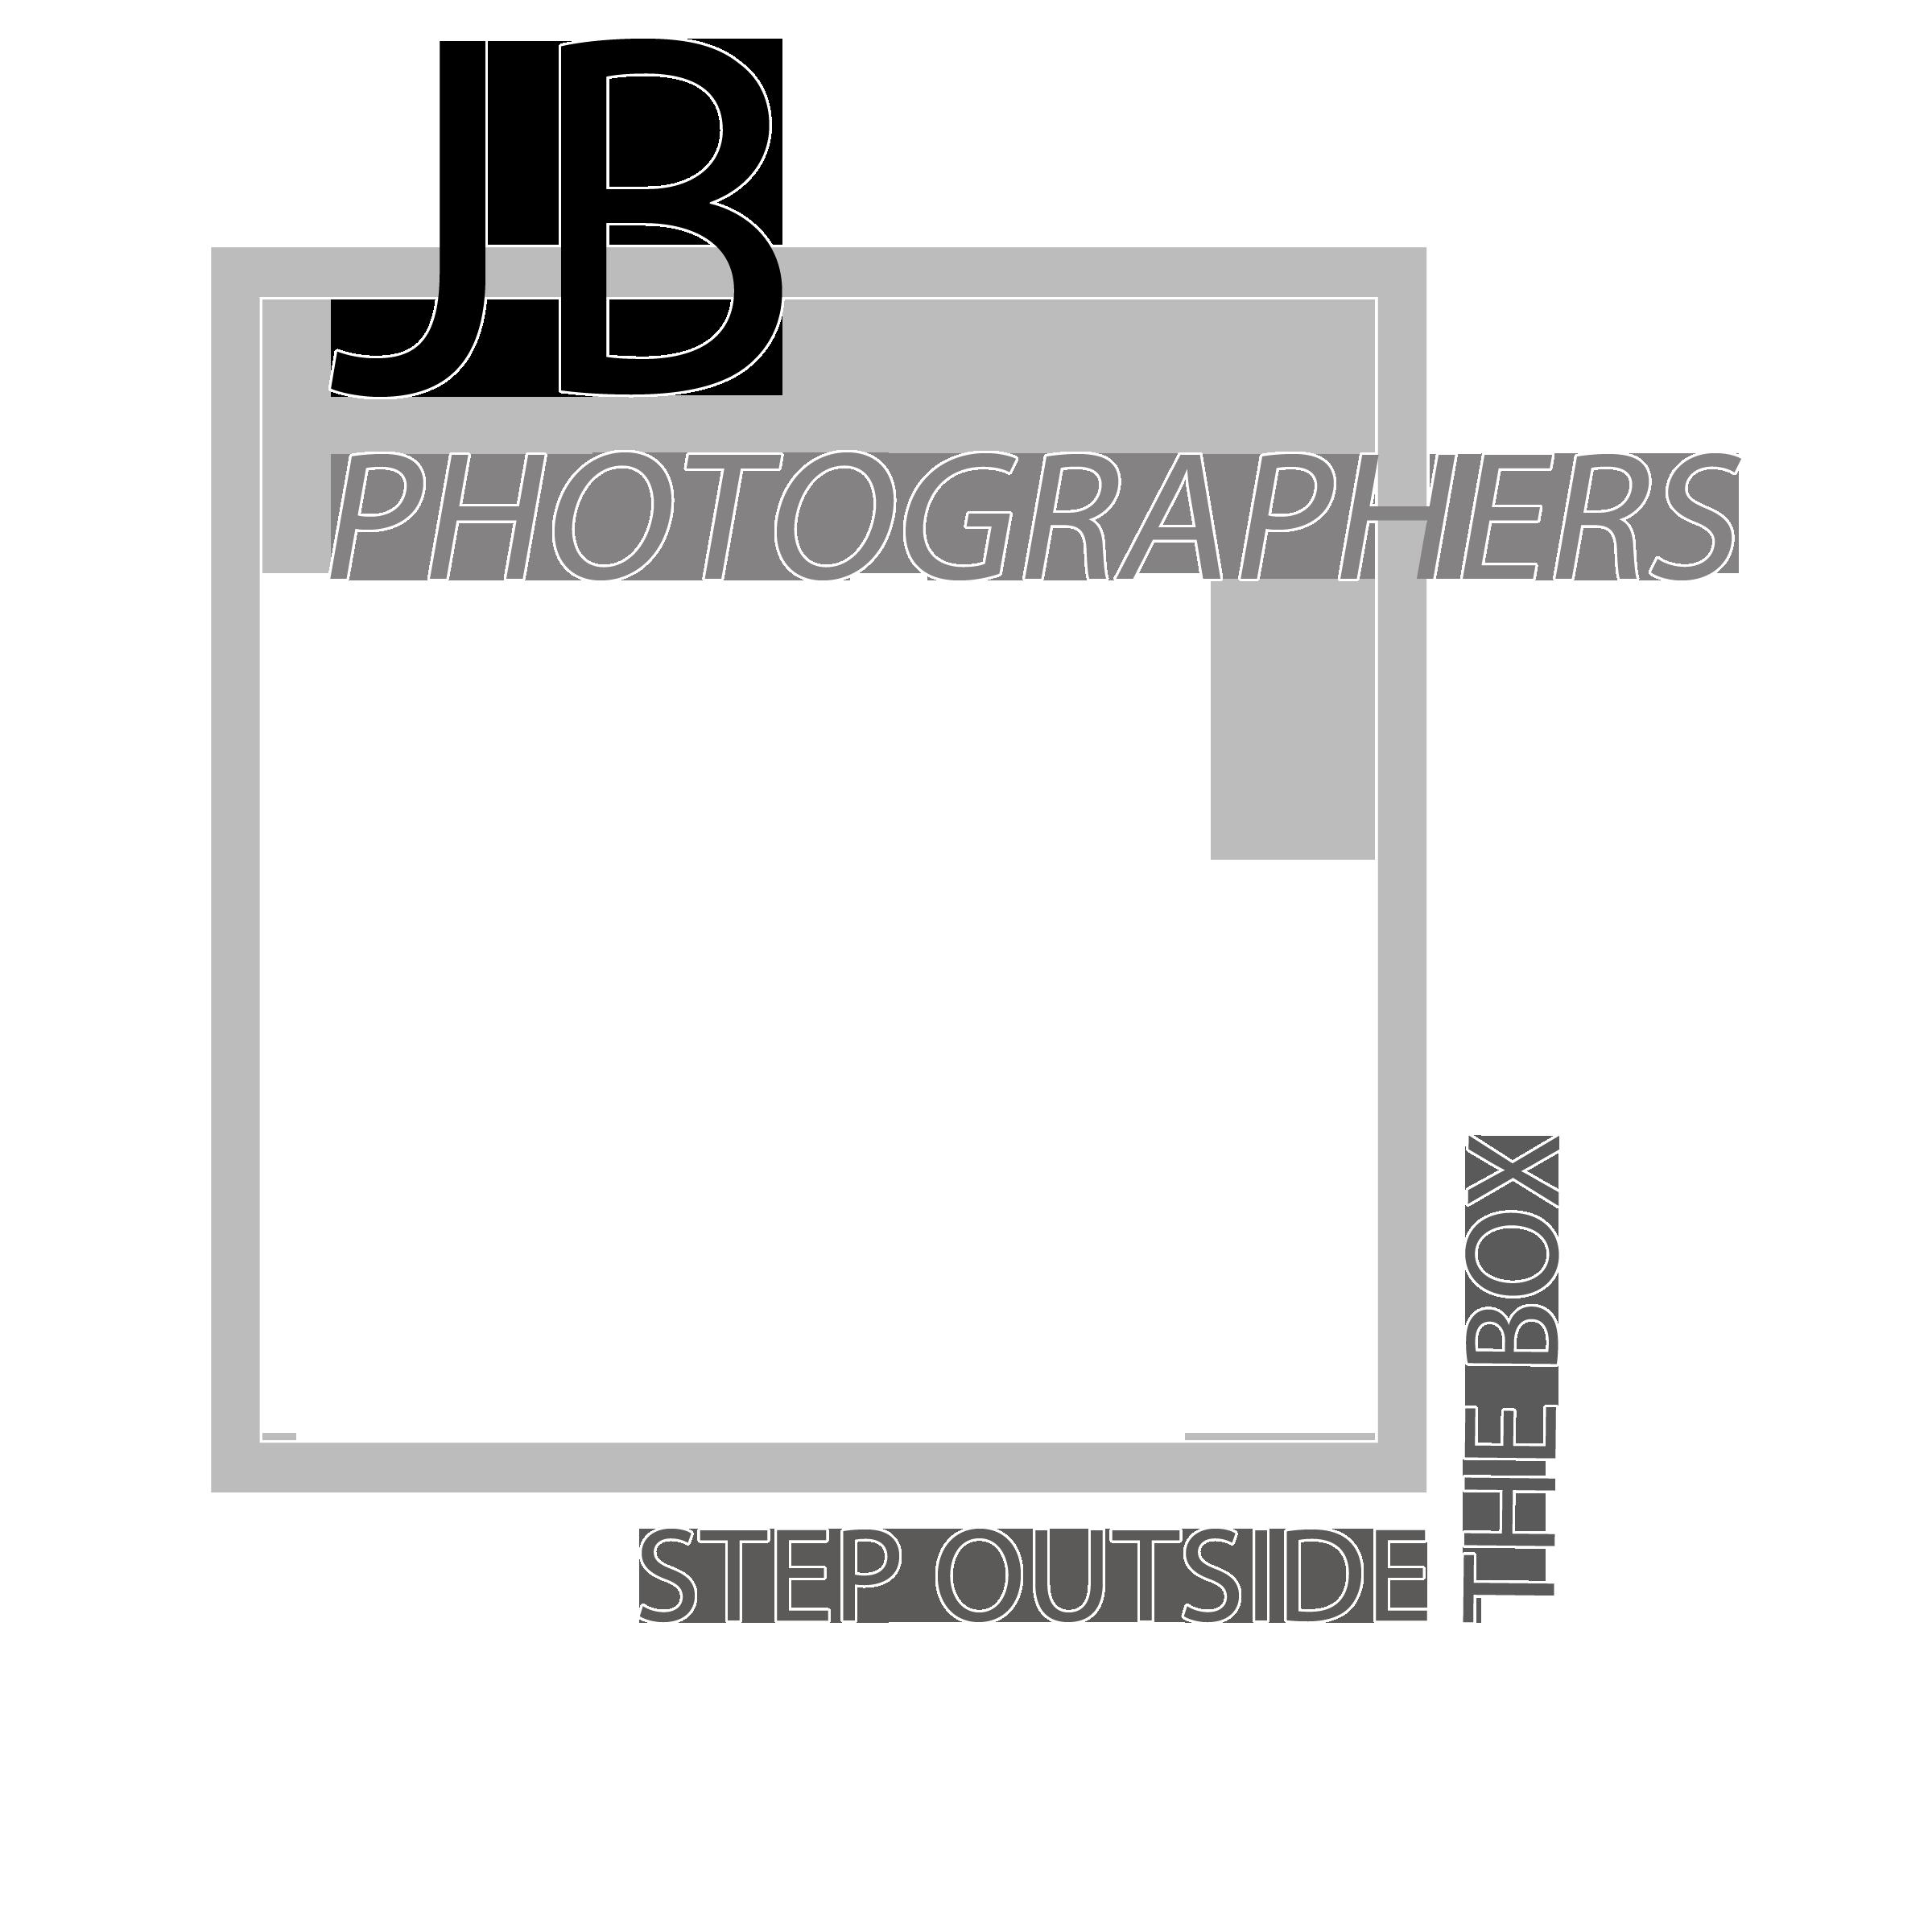 JB Photographers